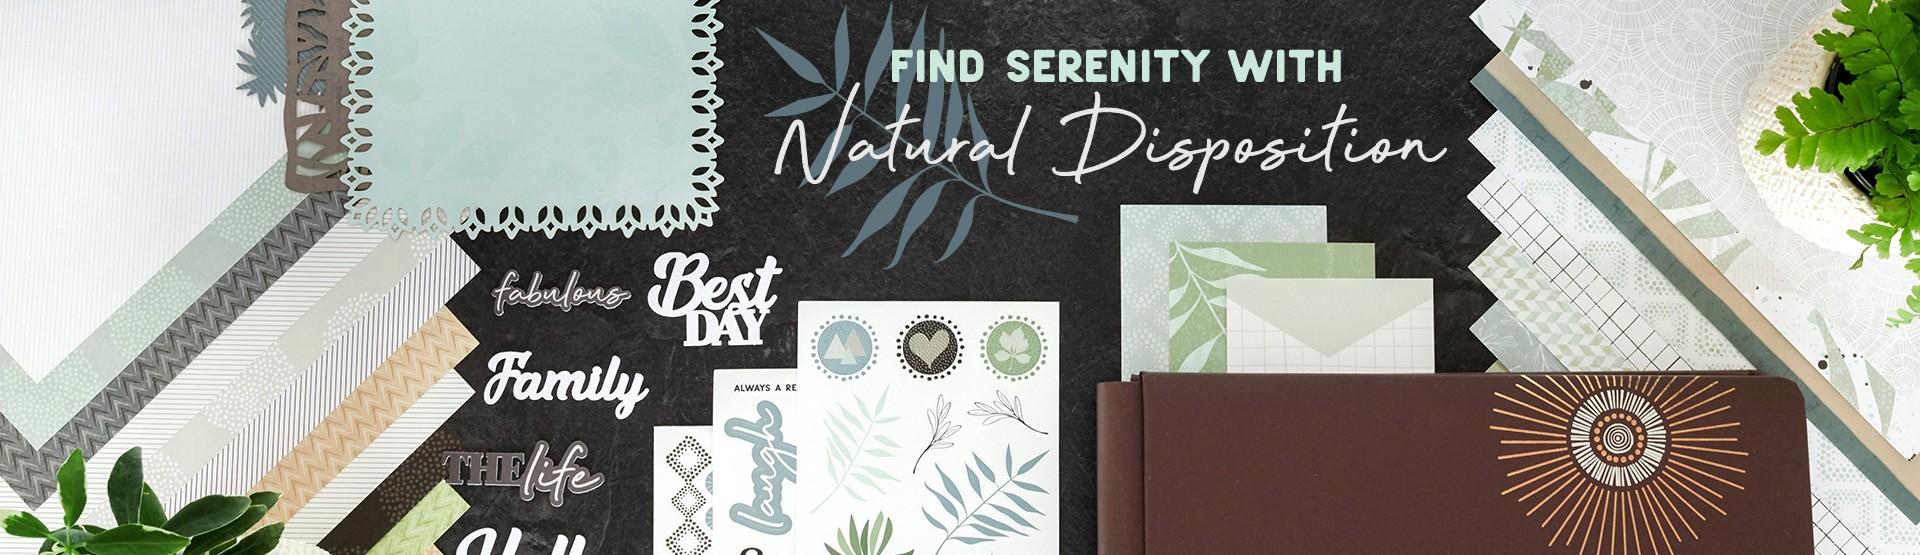 Natural Scrapbooking Supplies: Natural Disposition